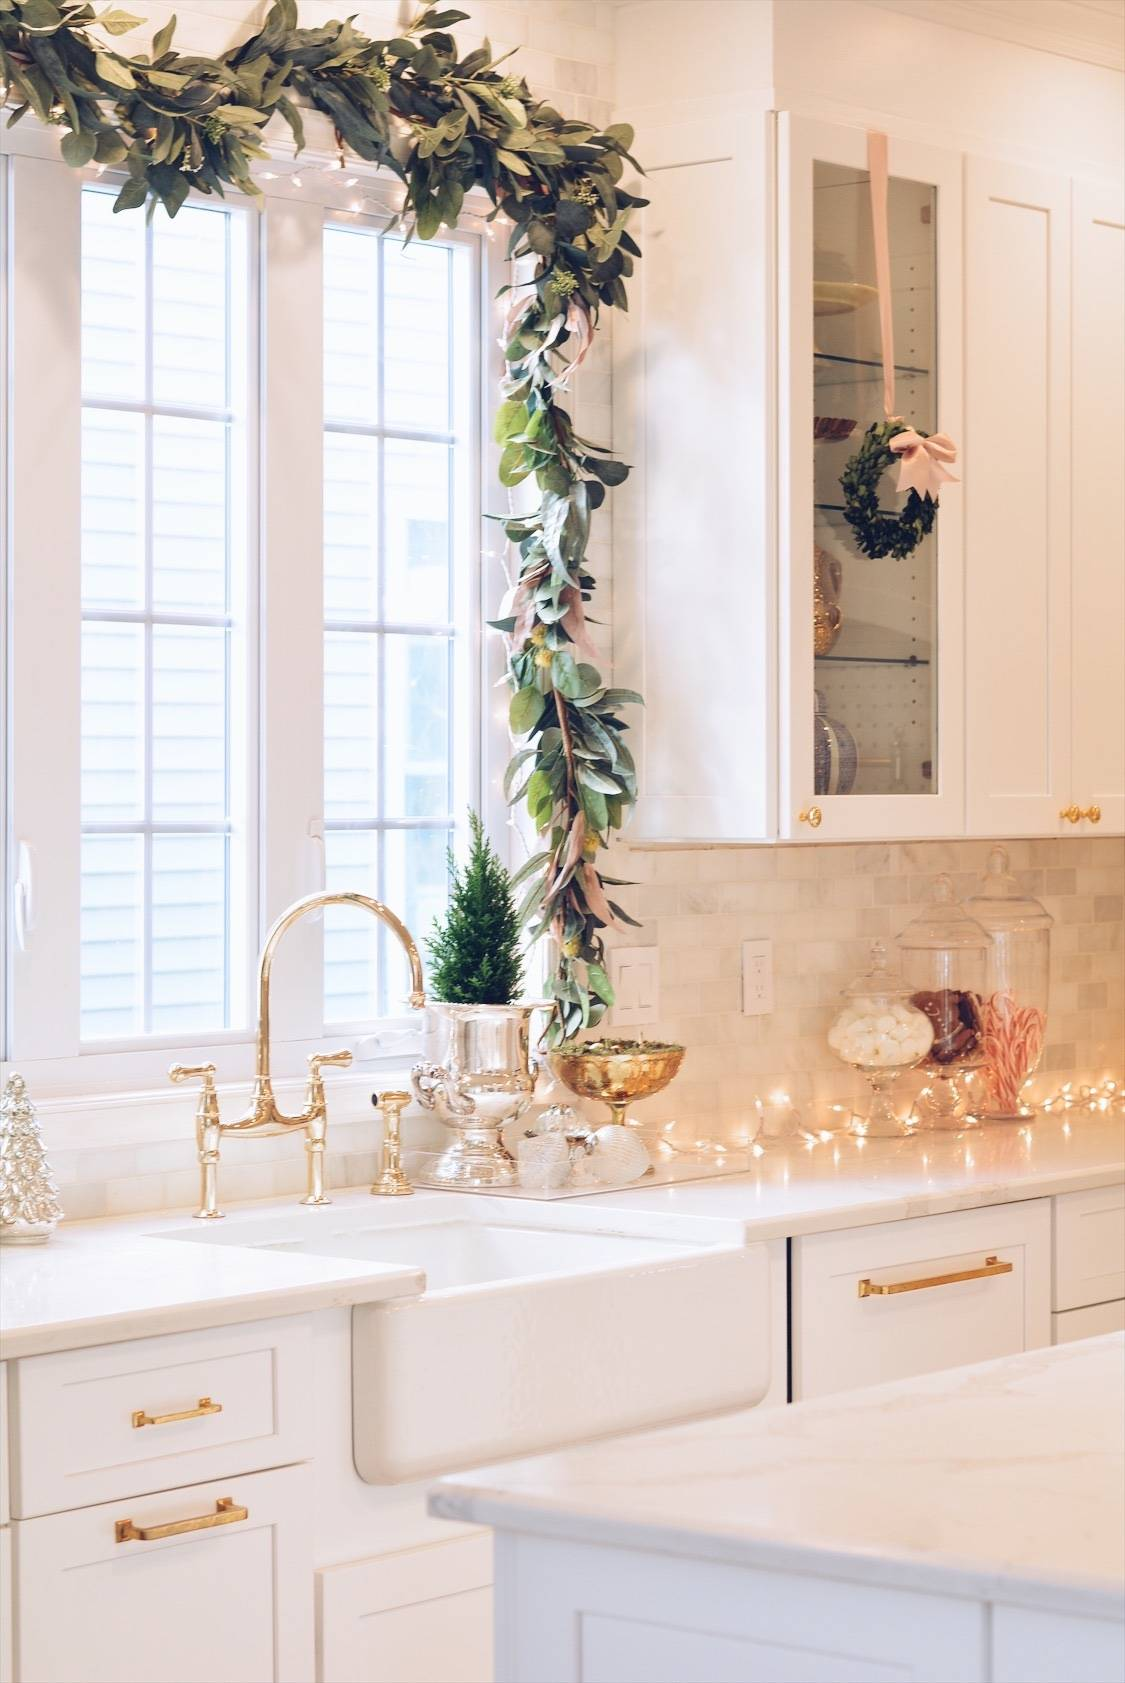 Elegant Christmas Part Ii Christmas Kitchen Decor The Pink Dream